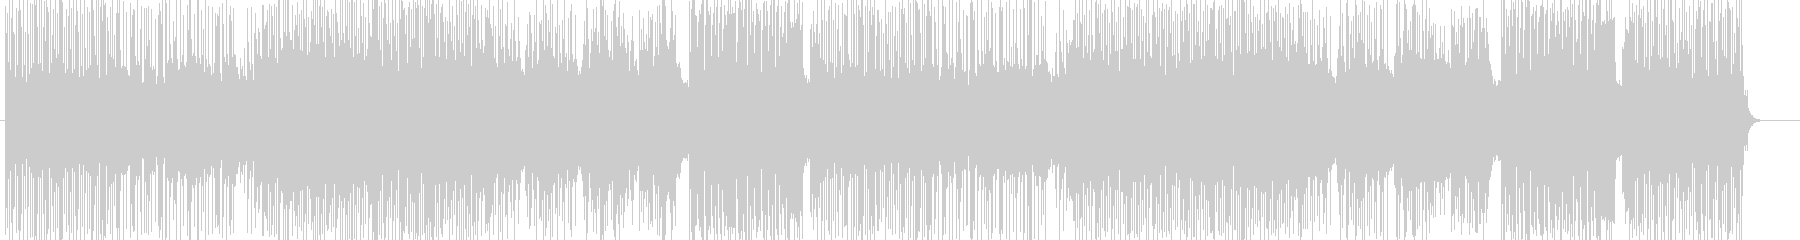 「HR/HM」「DARK」BGM264の未再生の波形